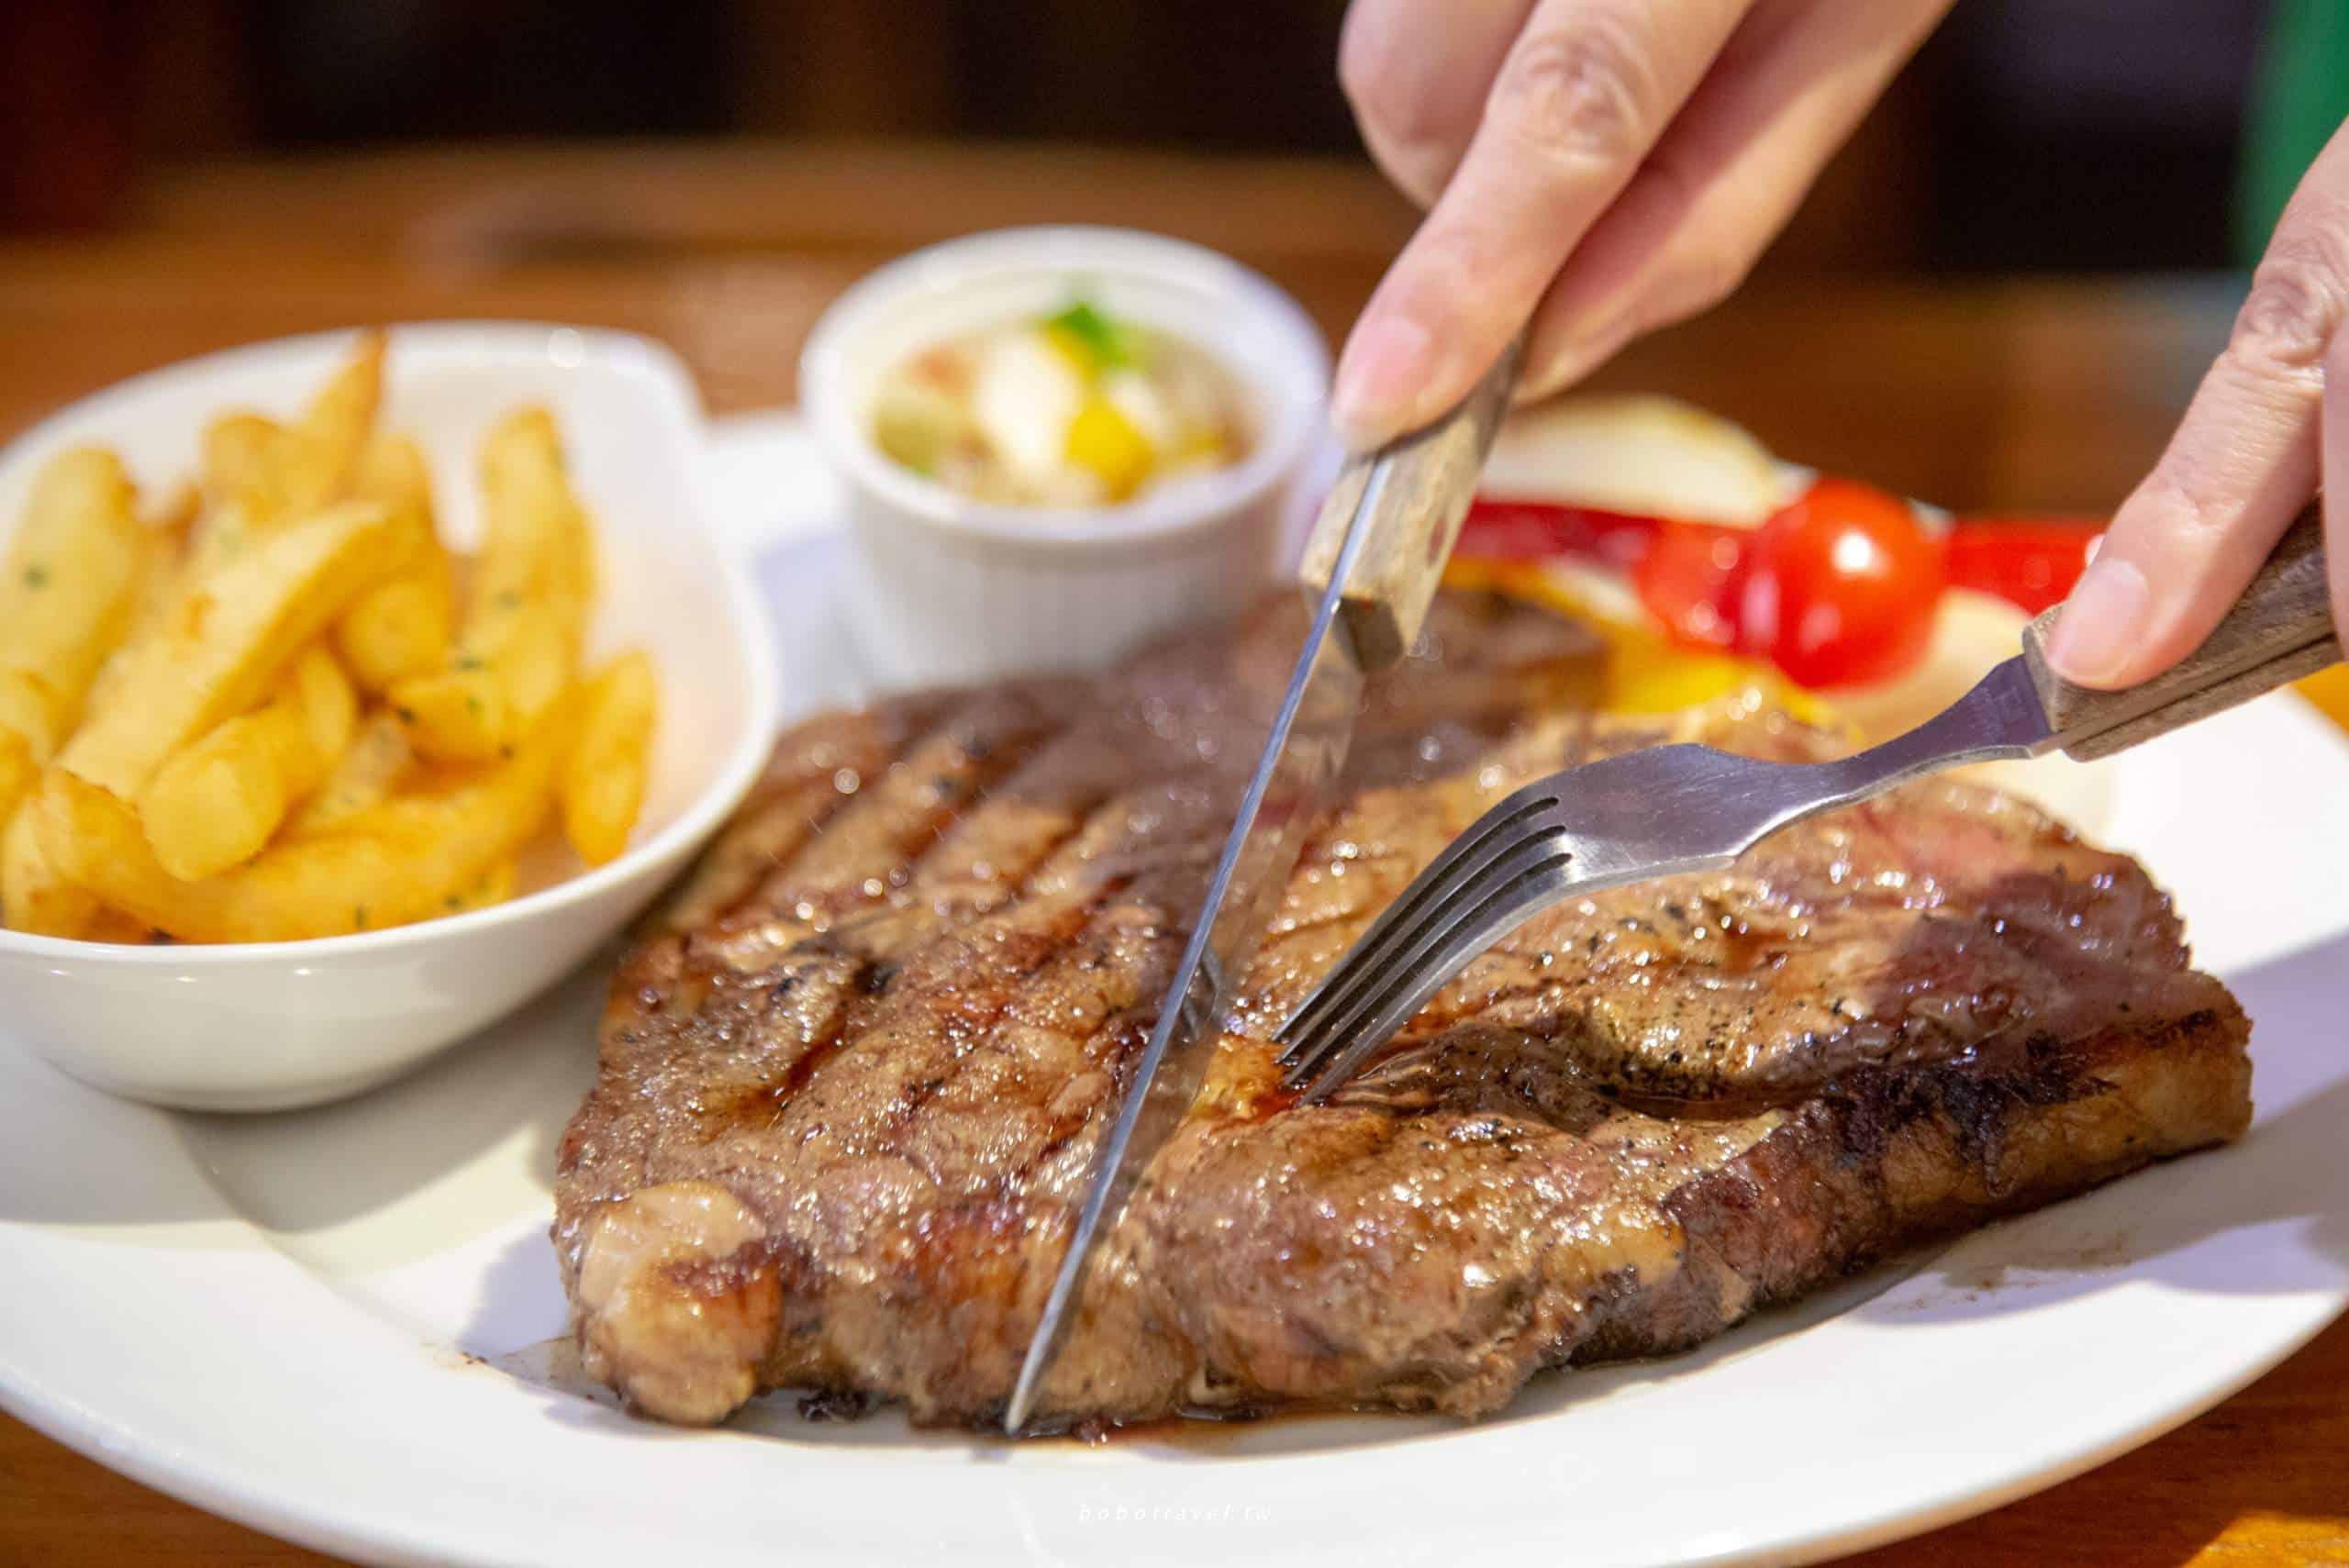 GAUCHO高卓人阿根廷炭烤餐廳、花博店|就是要和南美牛仔一樣大口吃肉!花博廣場內超正宗阿根廷料理,肉食主義者不能錯過的餐桌派對(圓山站美食)